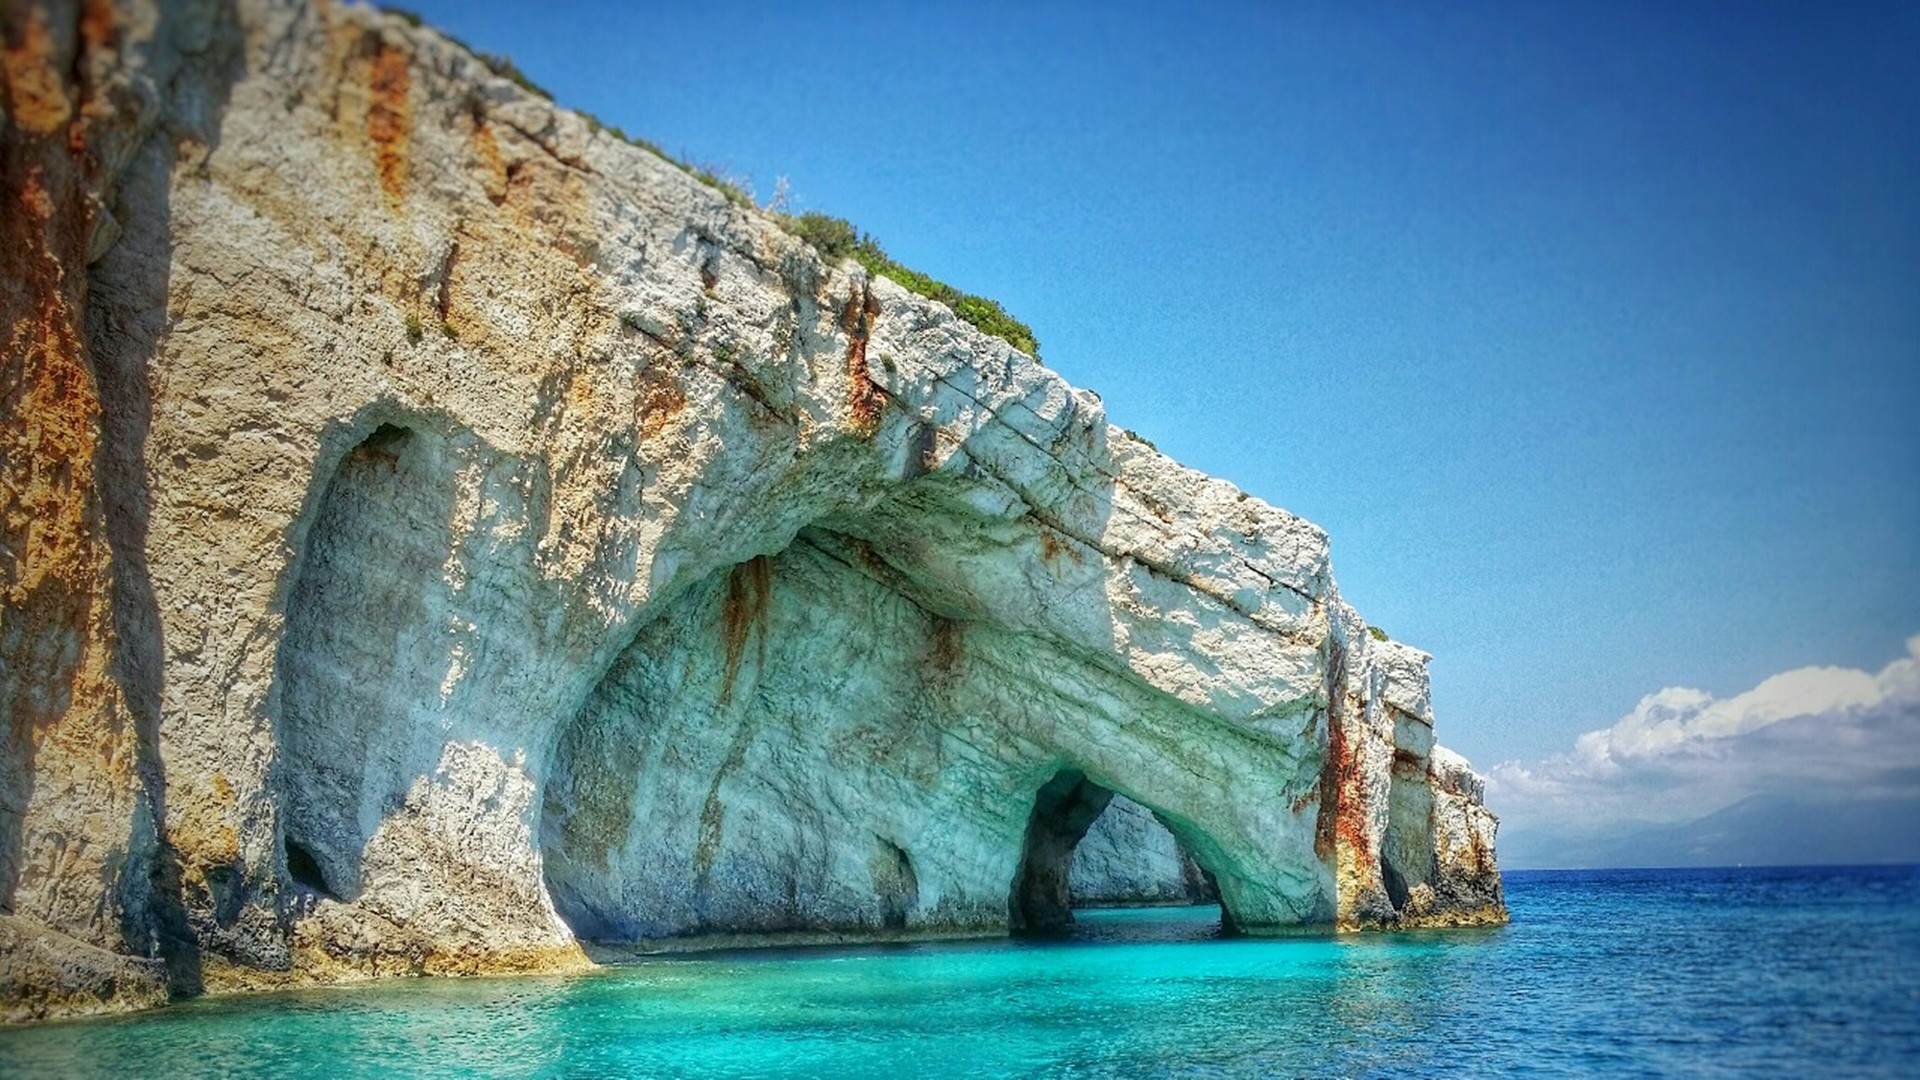 Blue Caves Zakynthos Island Greece Background Wallpaper 27150 1920x1080